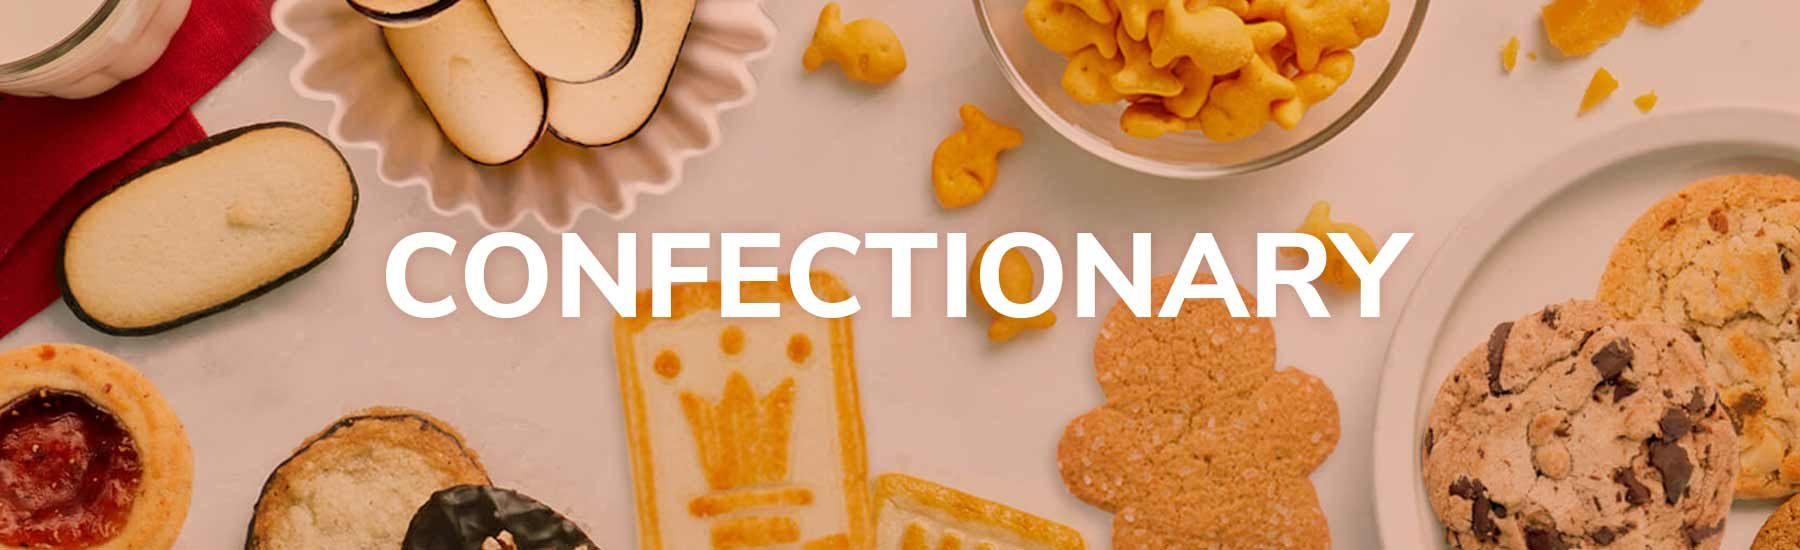 Gan Teck Kar Foods Confectionary Products